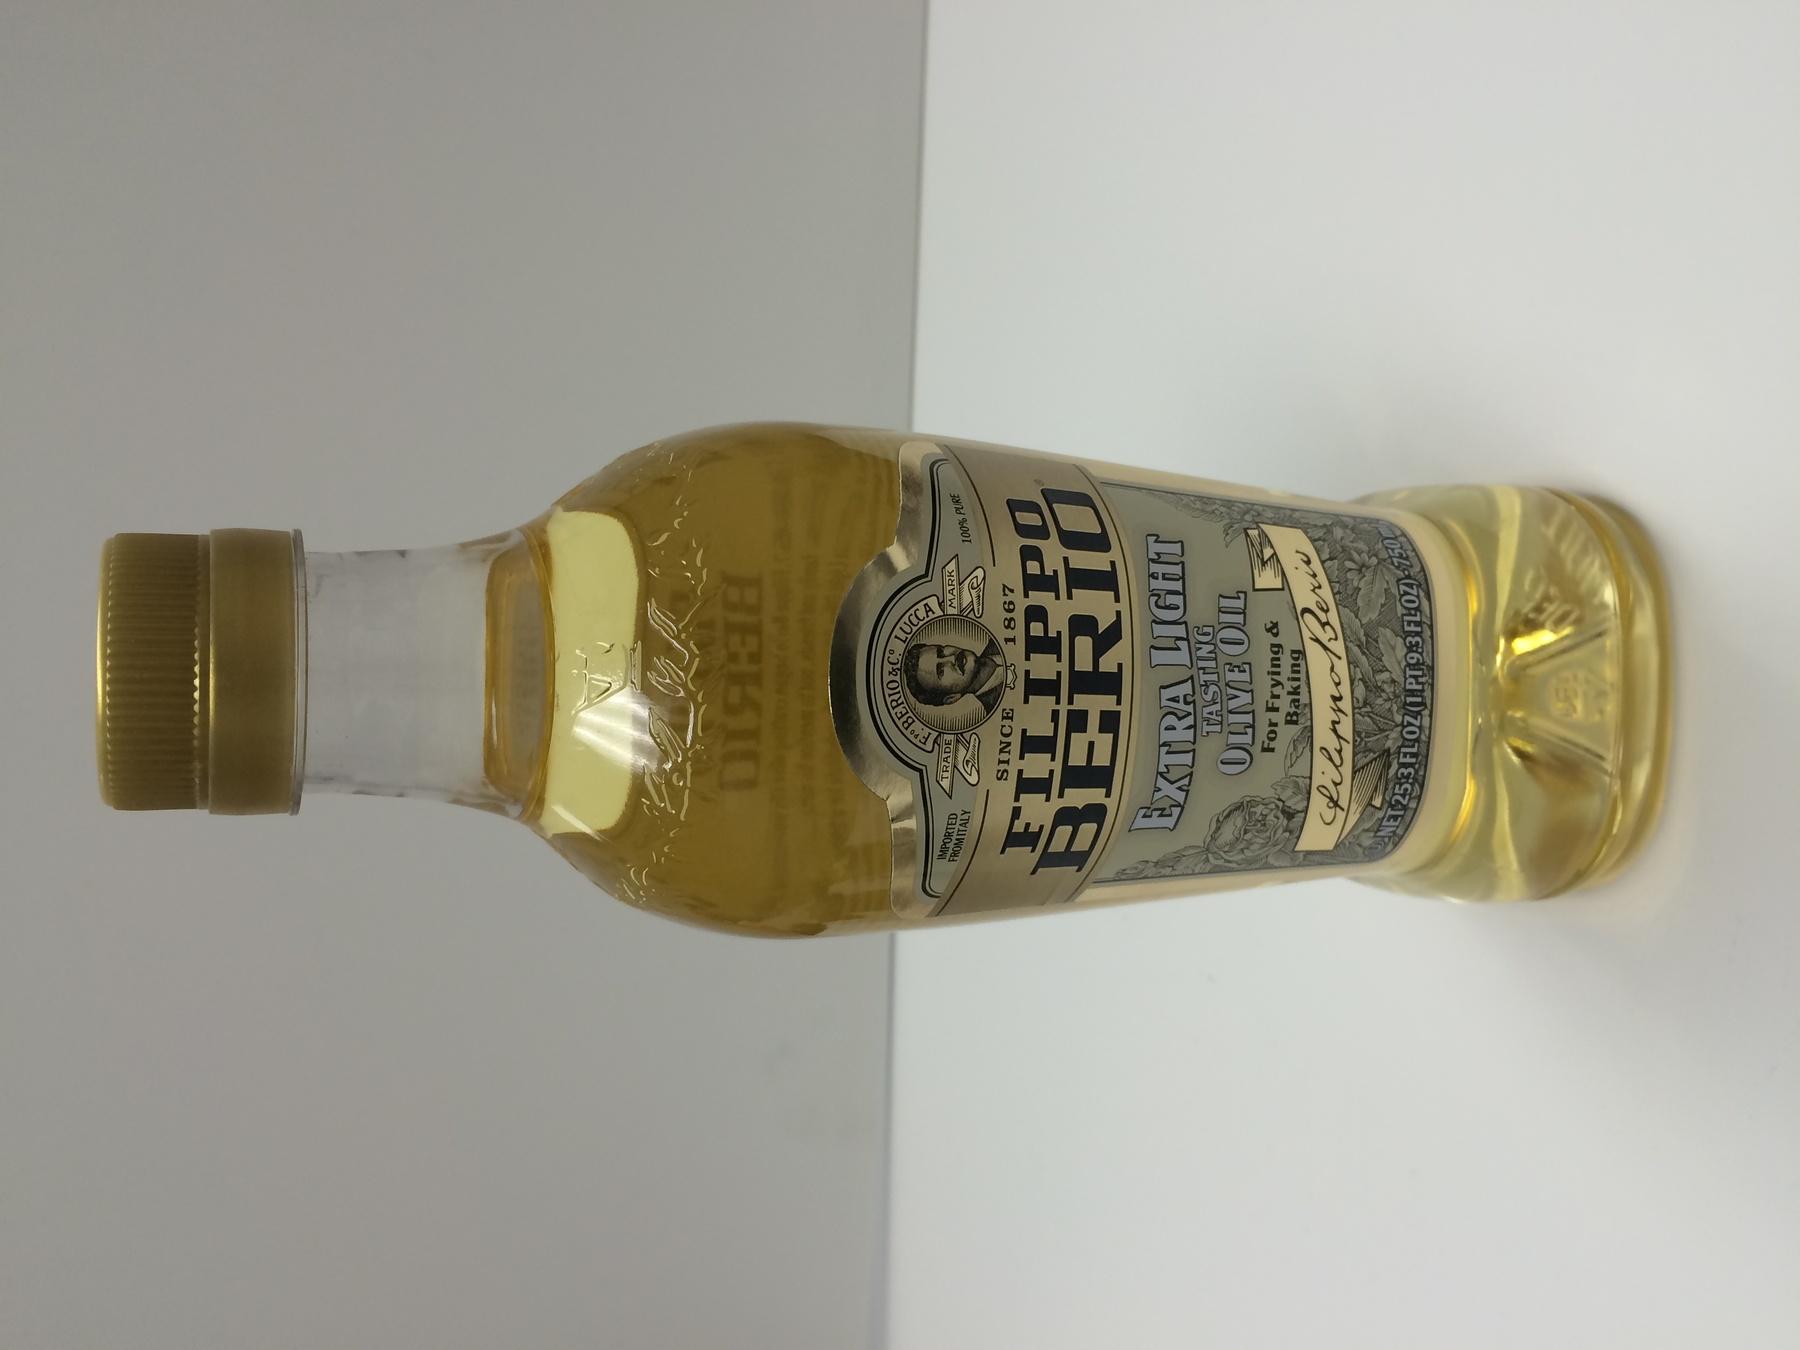 Curaleaf T15 Infused Olive Oil - 4oz Product image